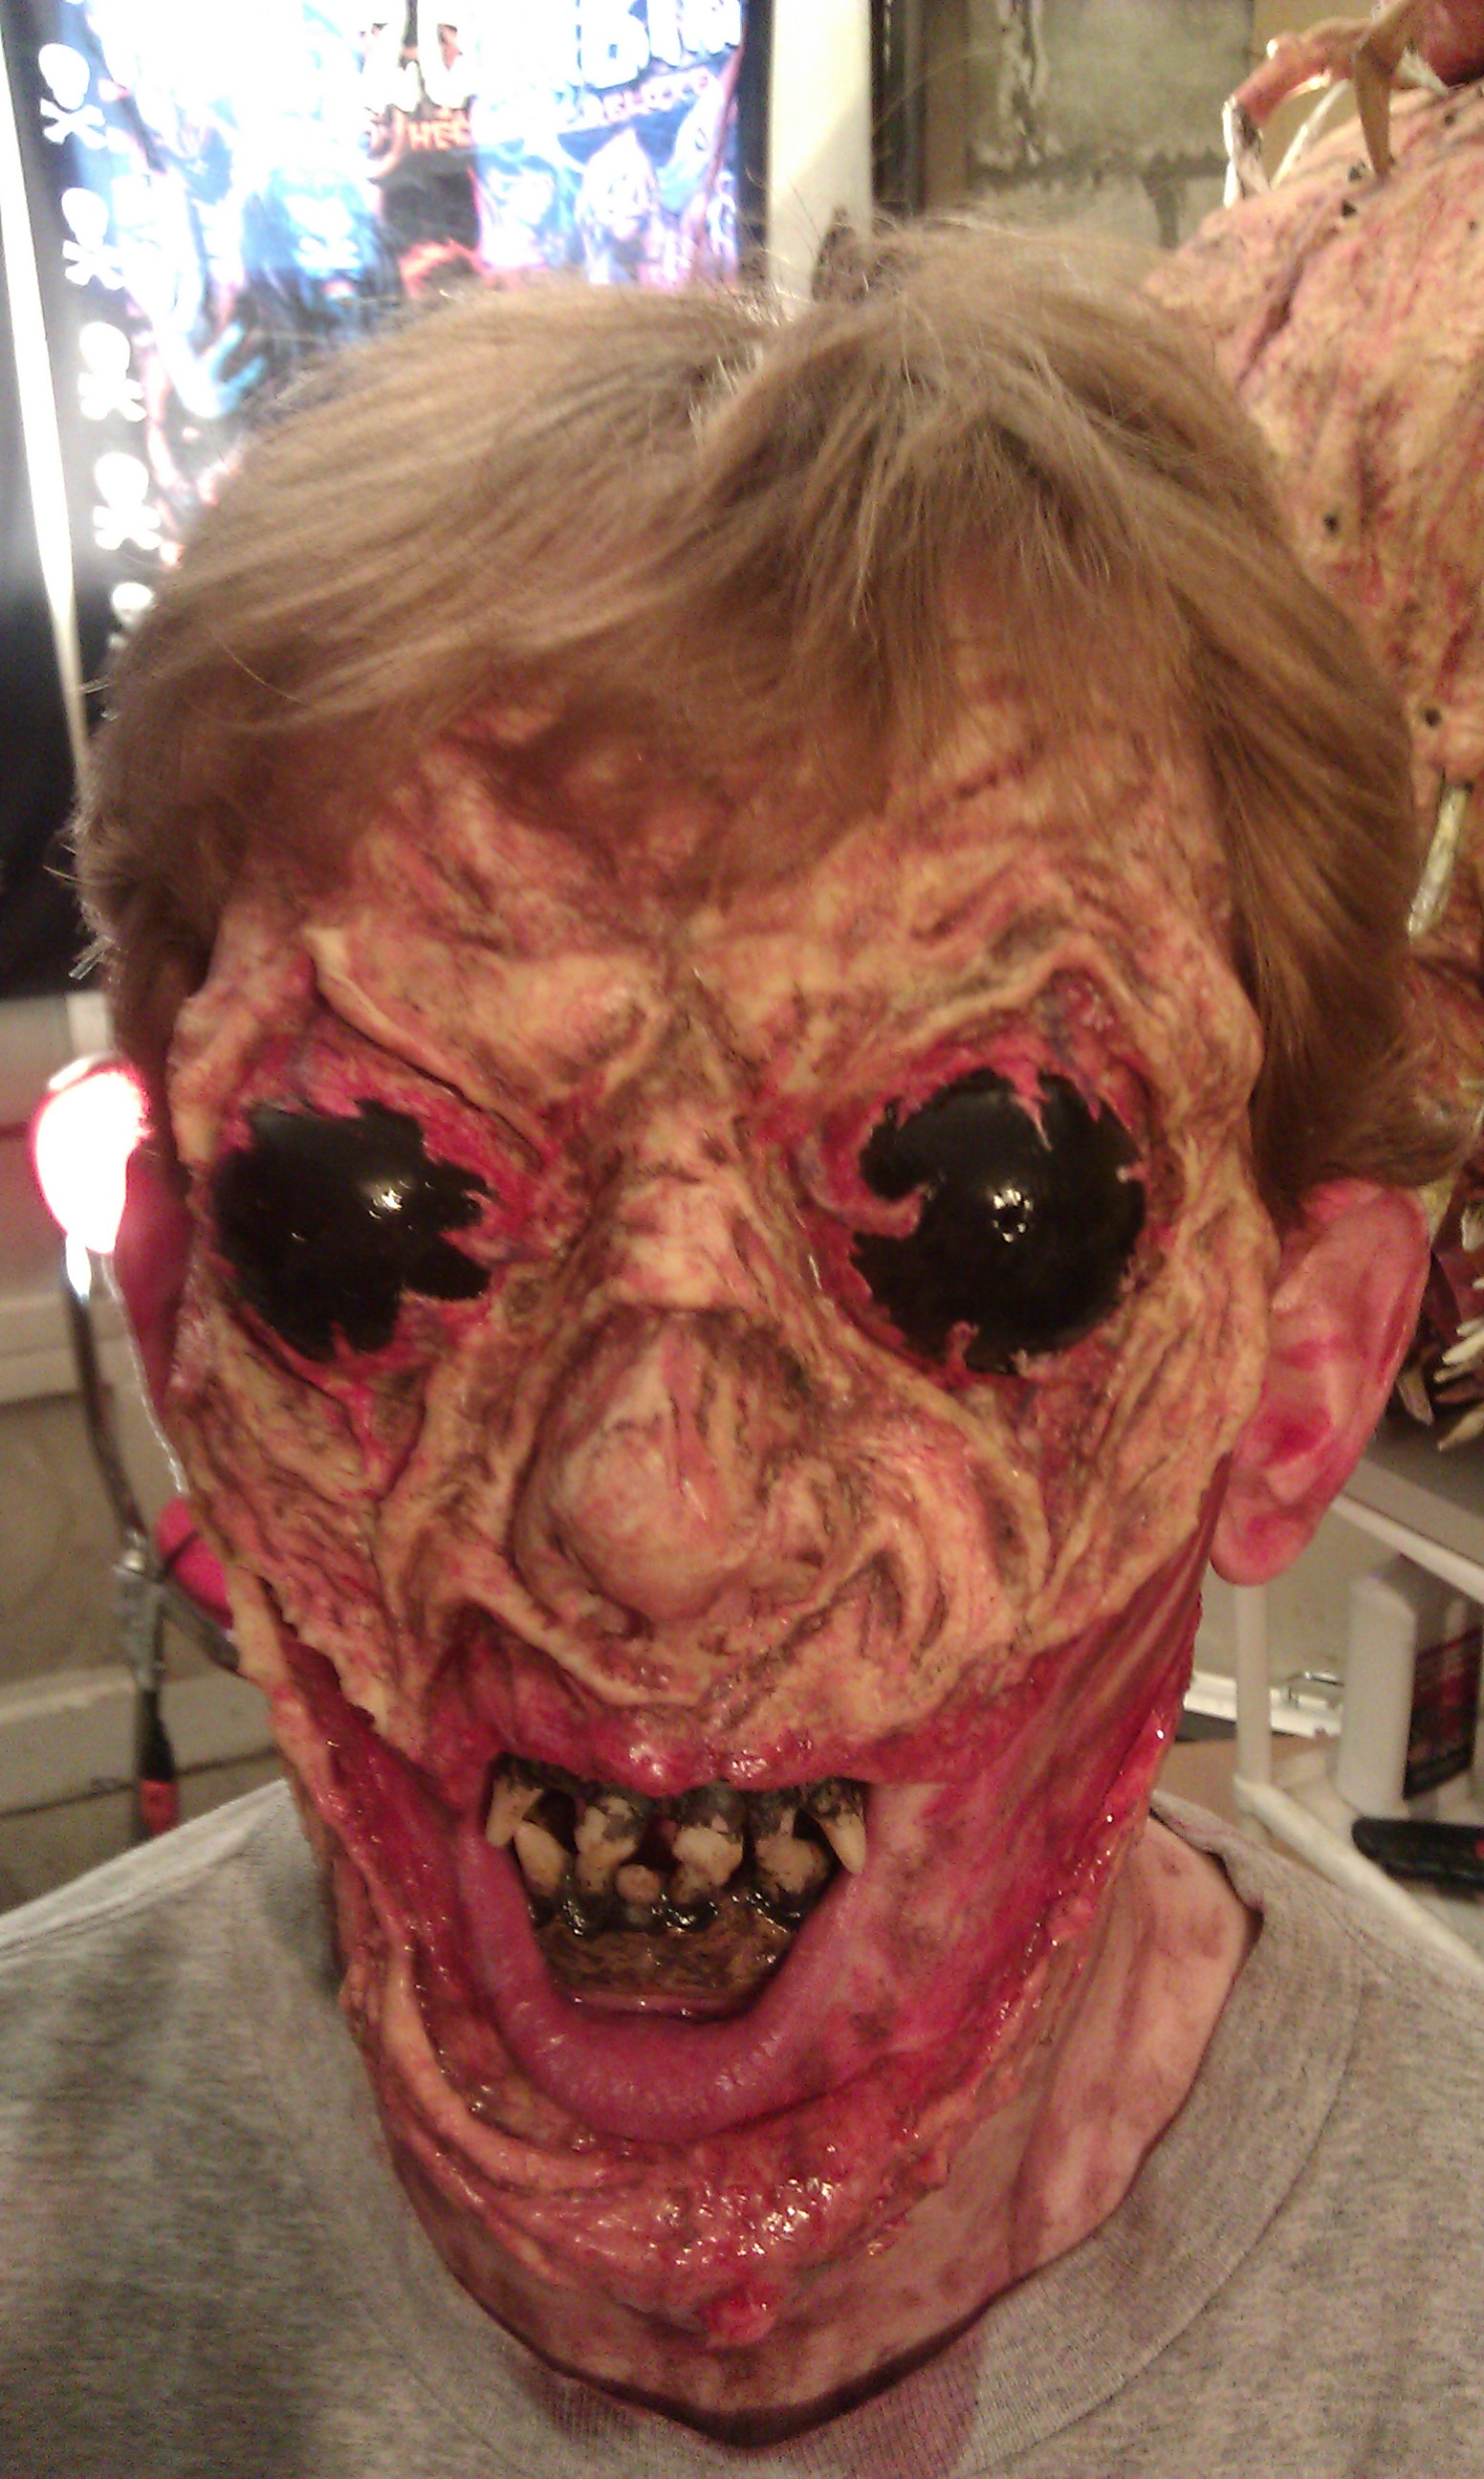 Mr. Creepy